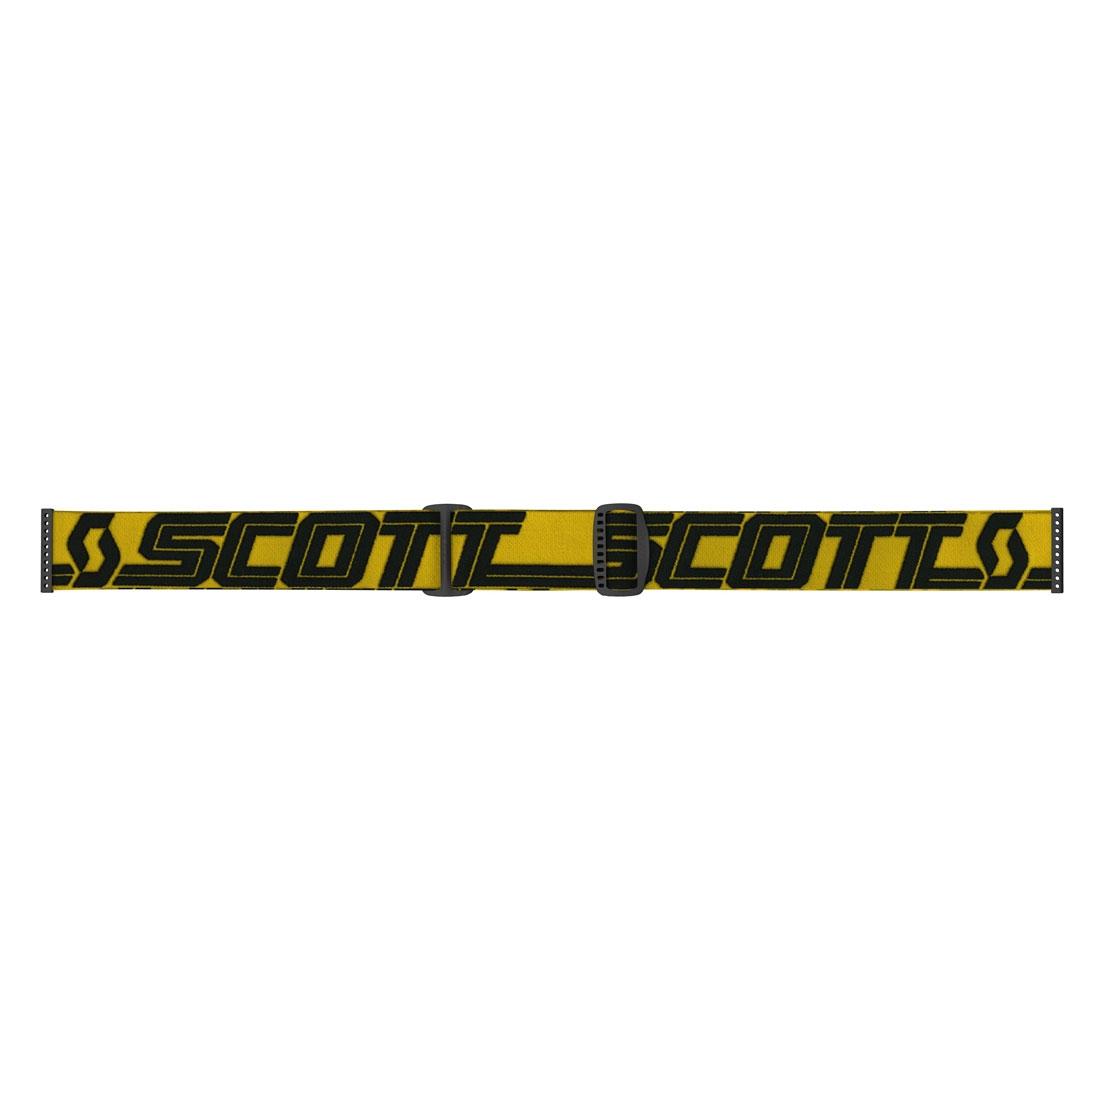 Occhiali (maschera) cross 2020 Scott FURY yellow black lente yellow chrome 2